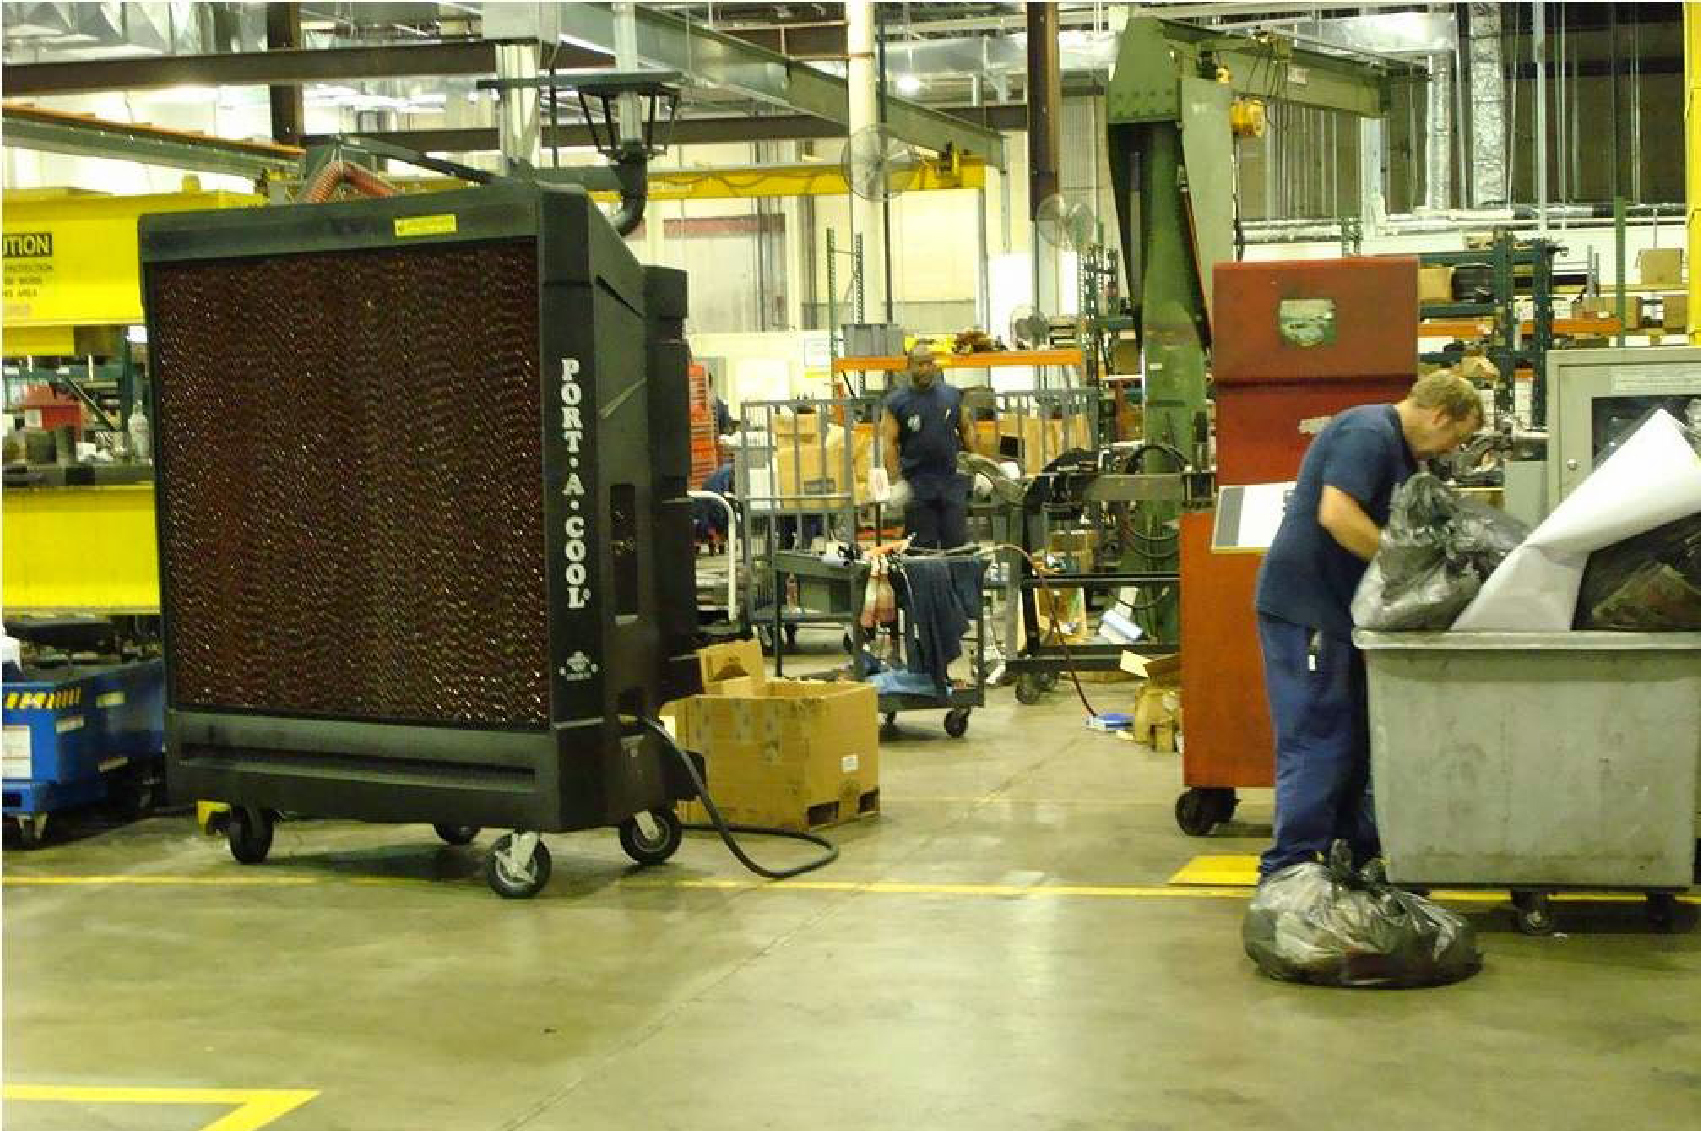 Port A Cool 48 Industriele machine koeling